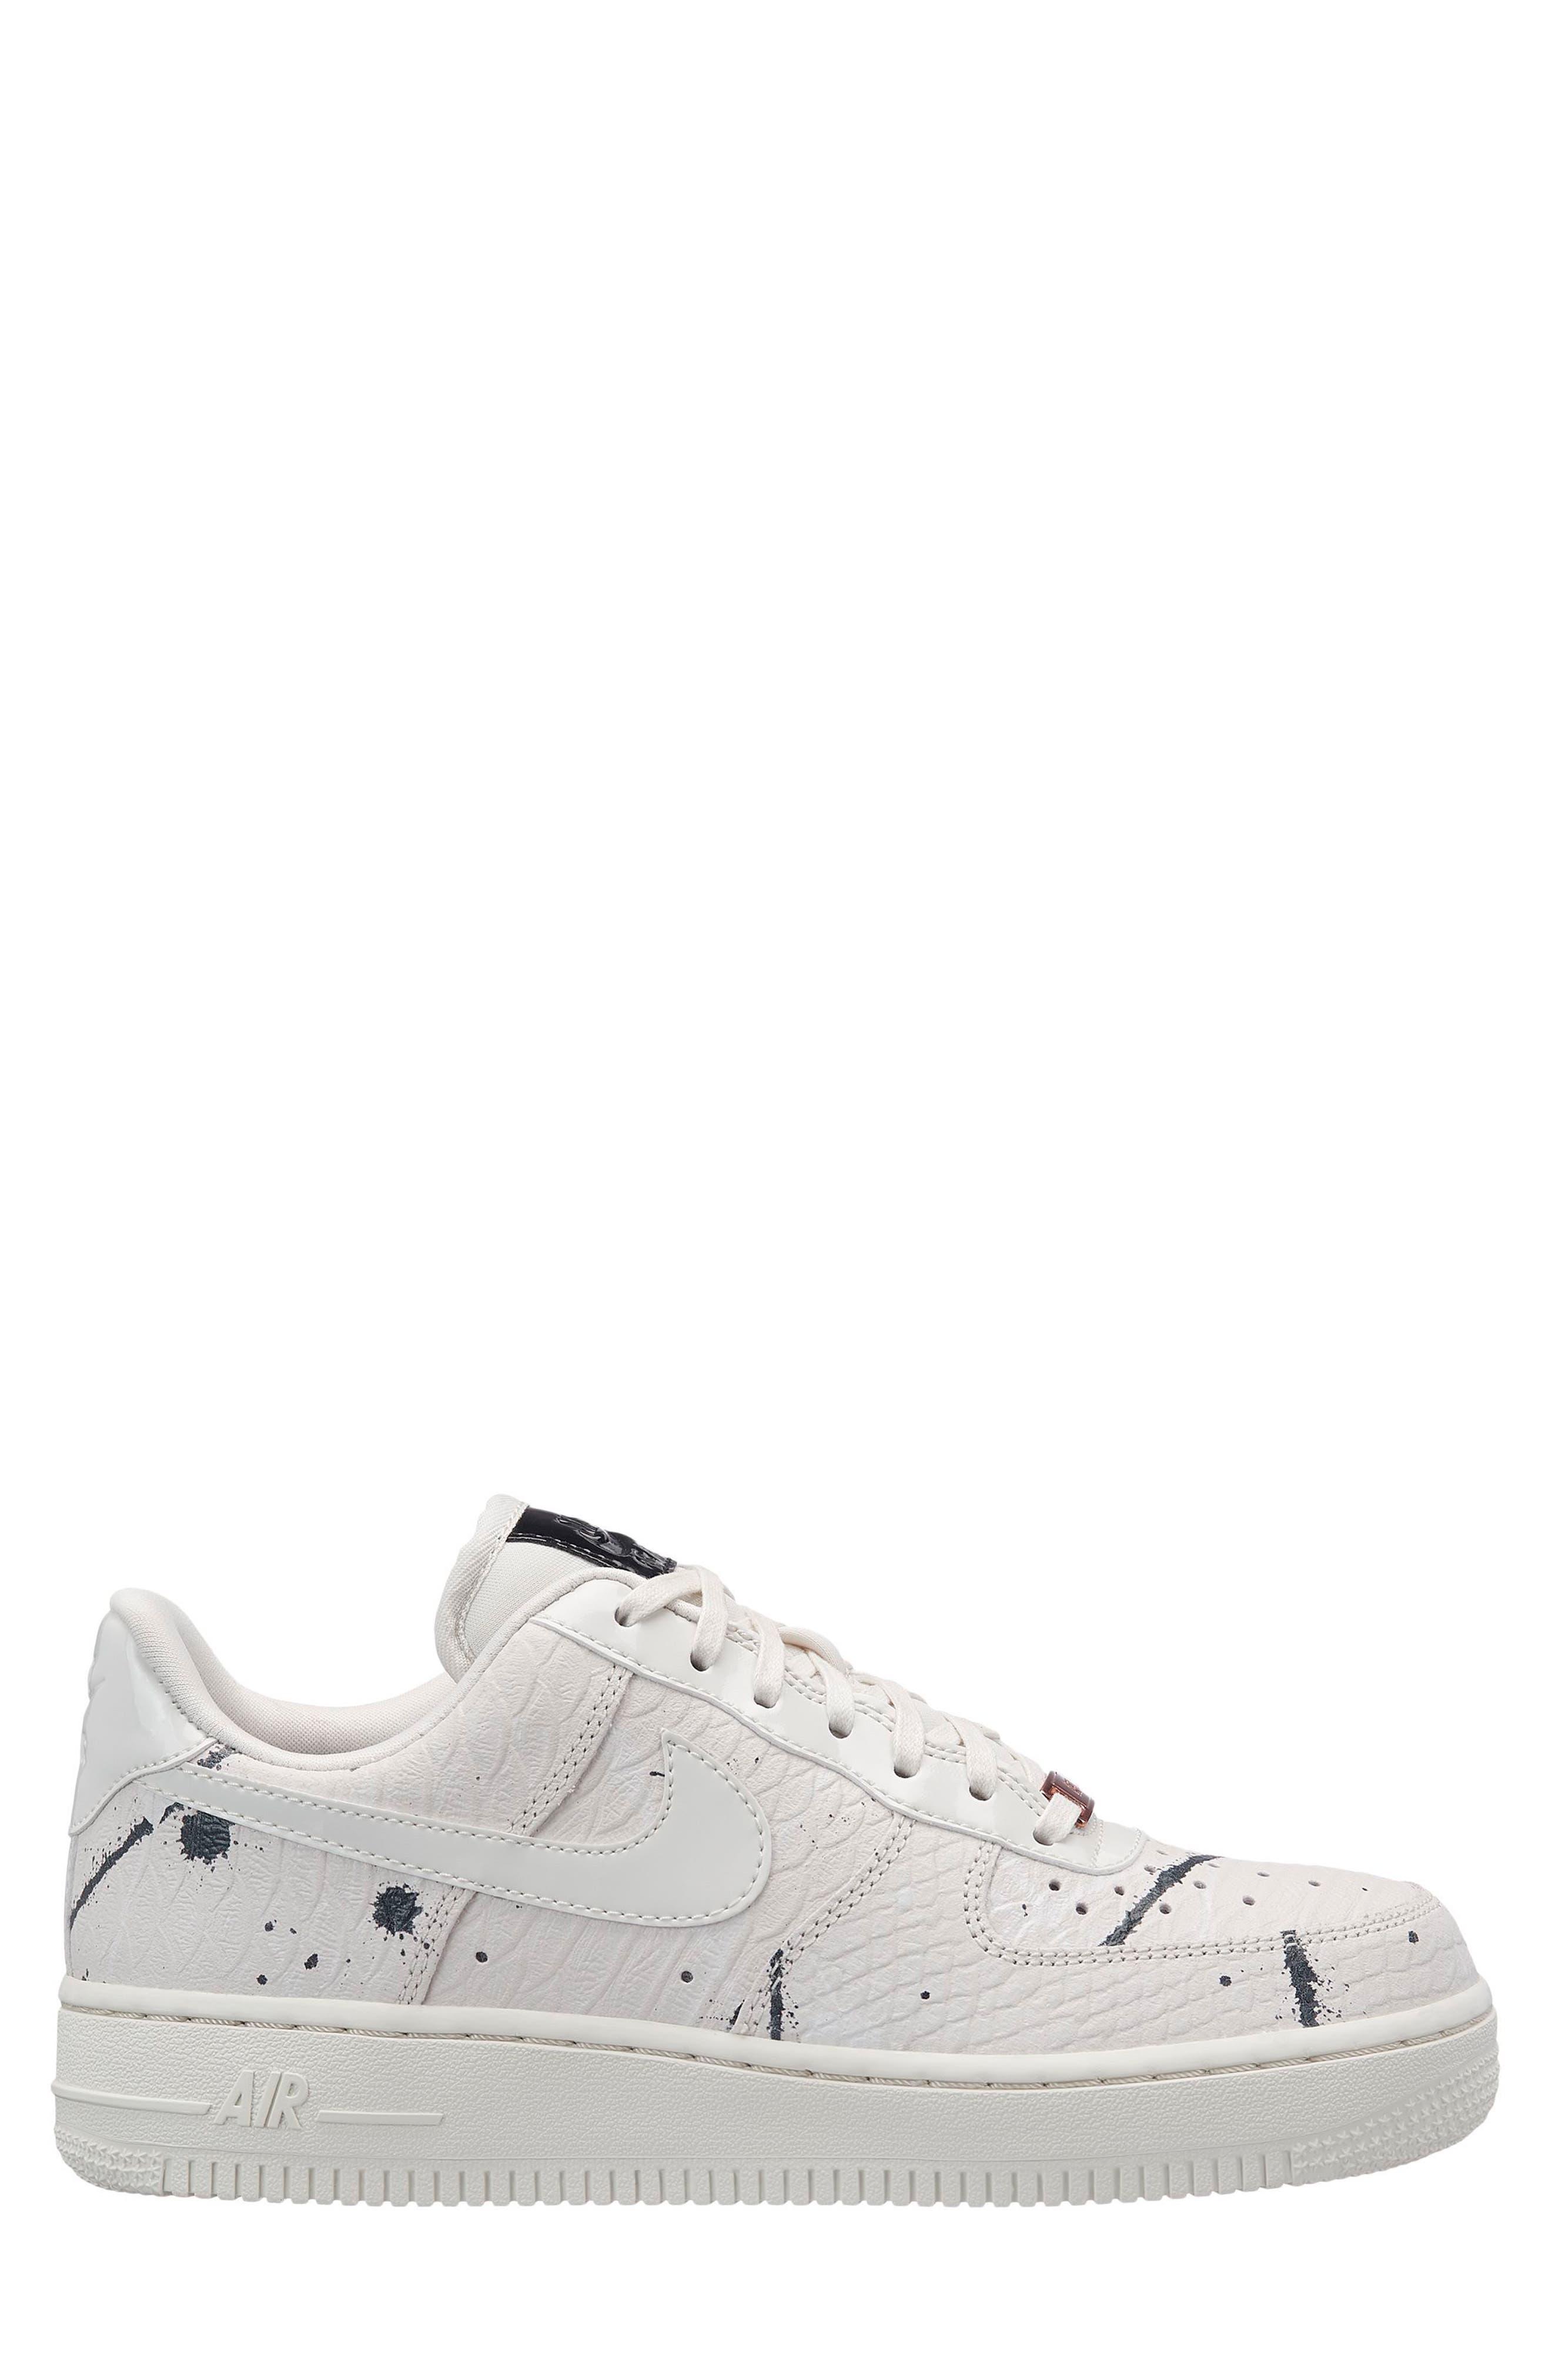 Alternate Image 1 Selected - Nike Air Force 1 '07 LX Sneaker (Women)